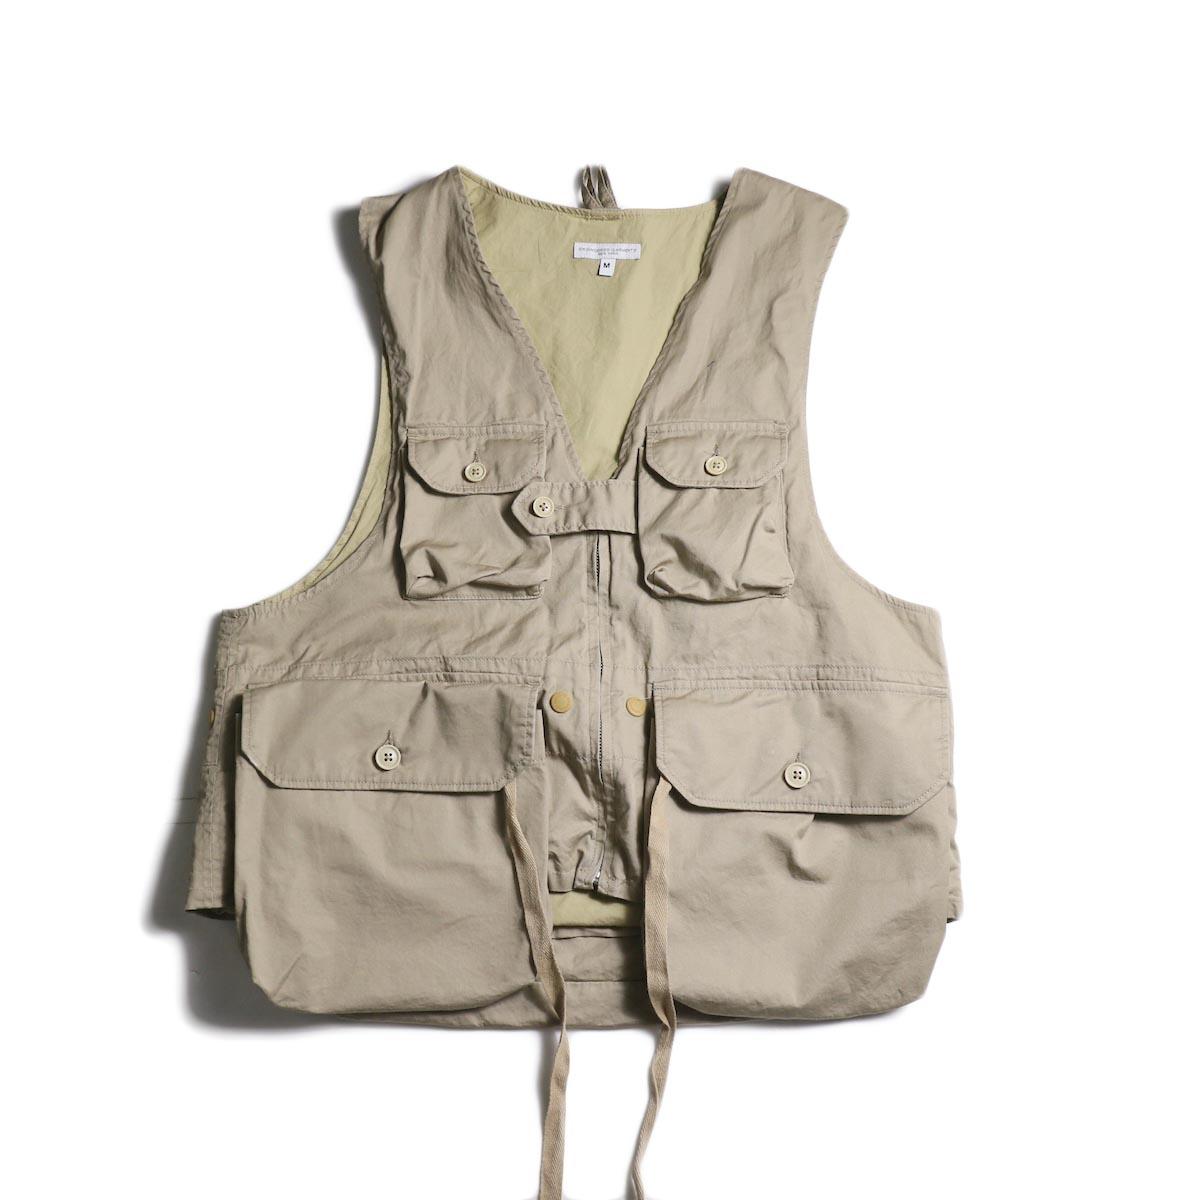 Engineered Garments / Game Vest -High Count Twill (Khaki)